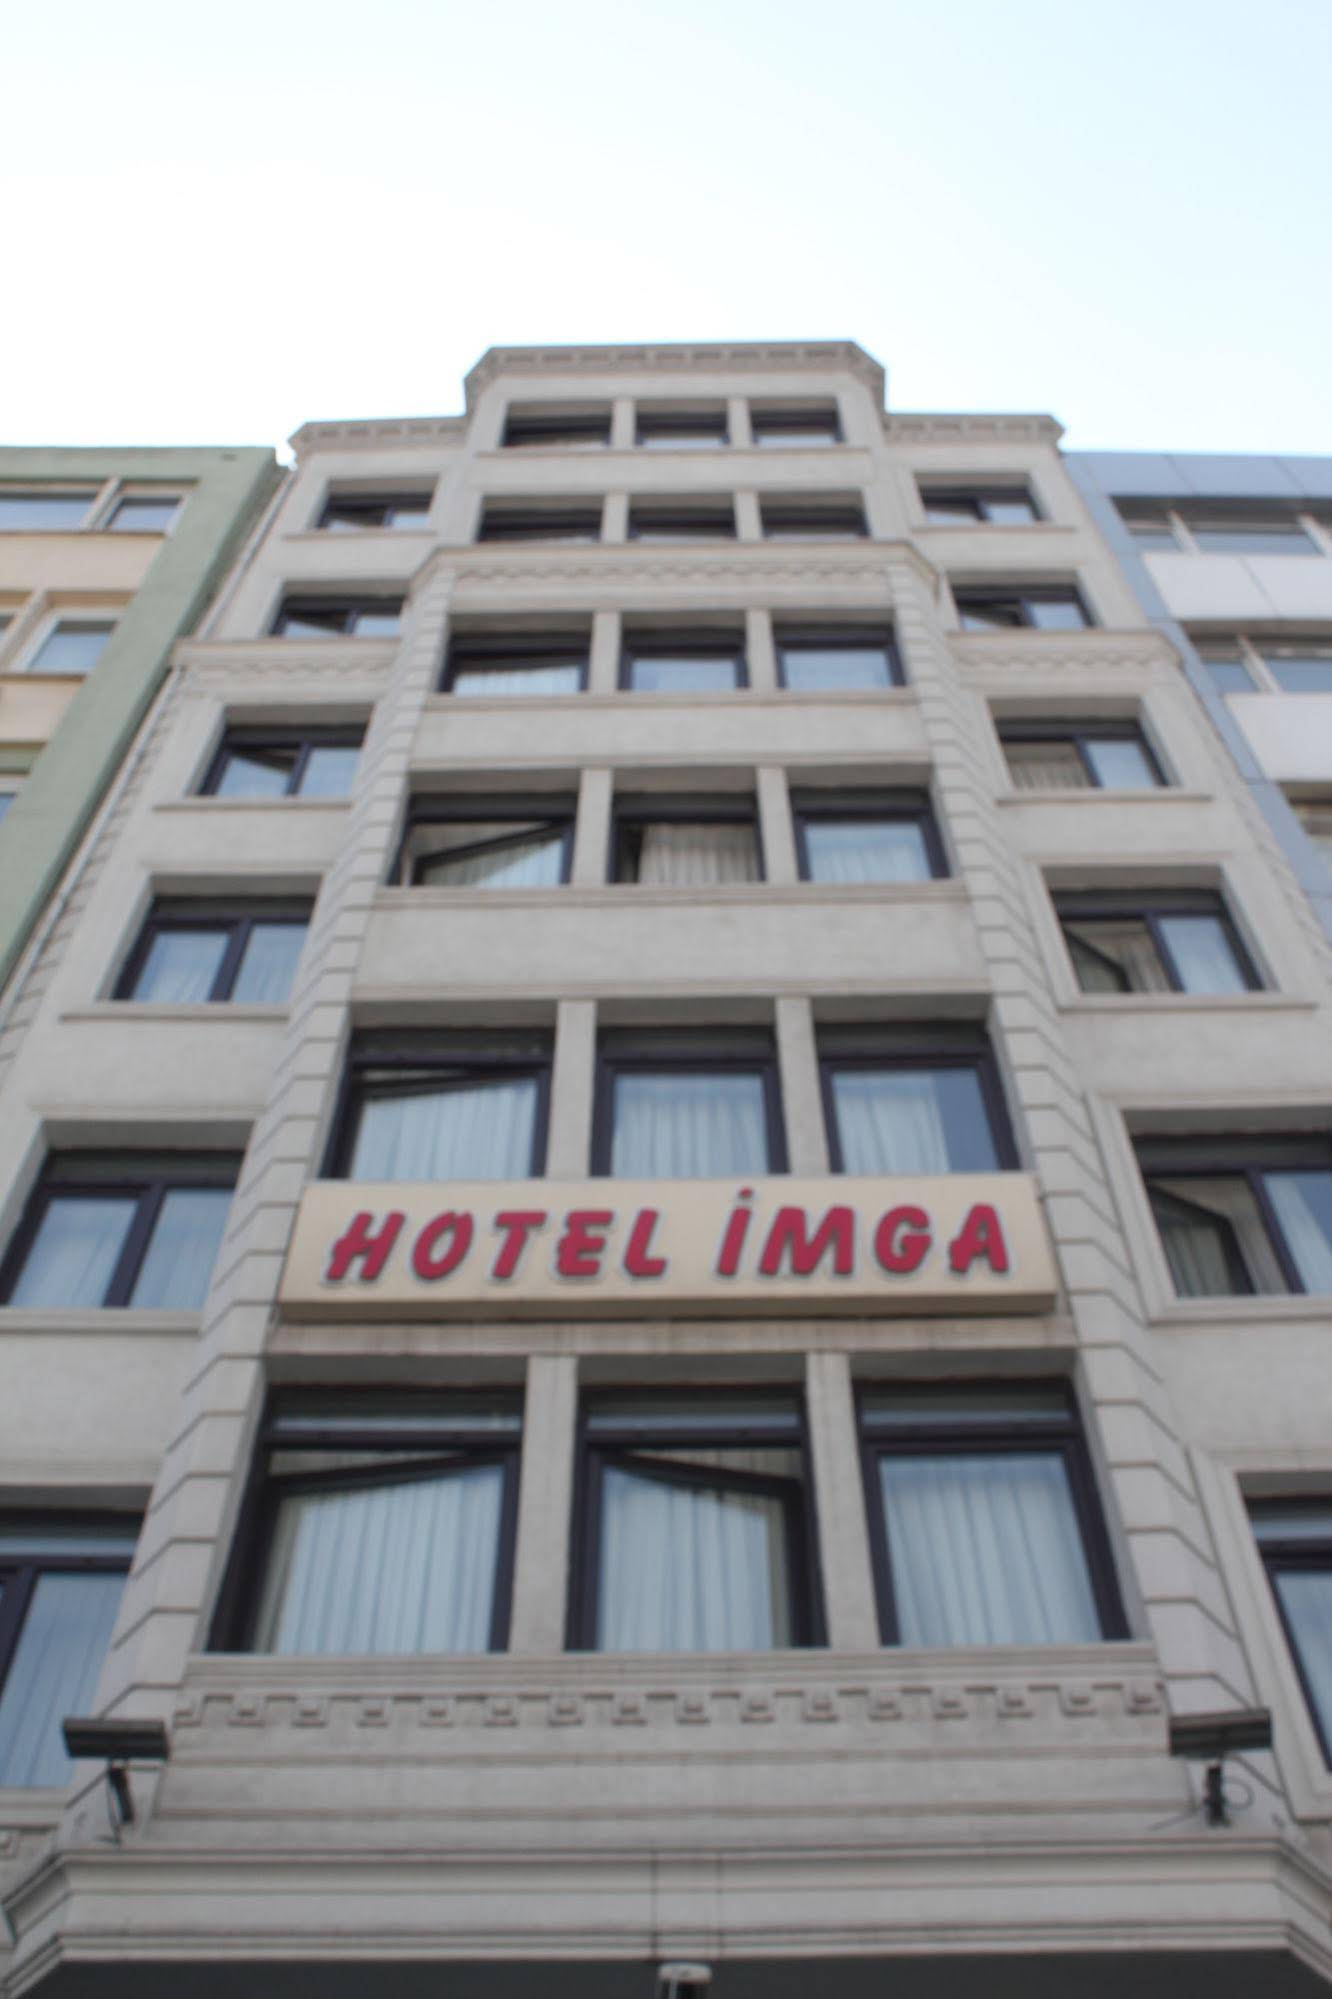 Hotel Imga